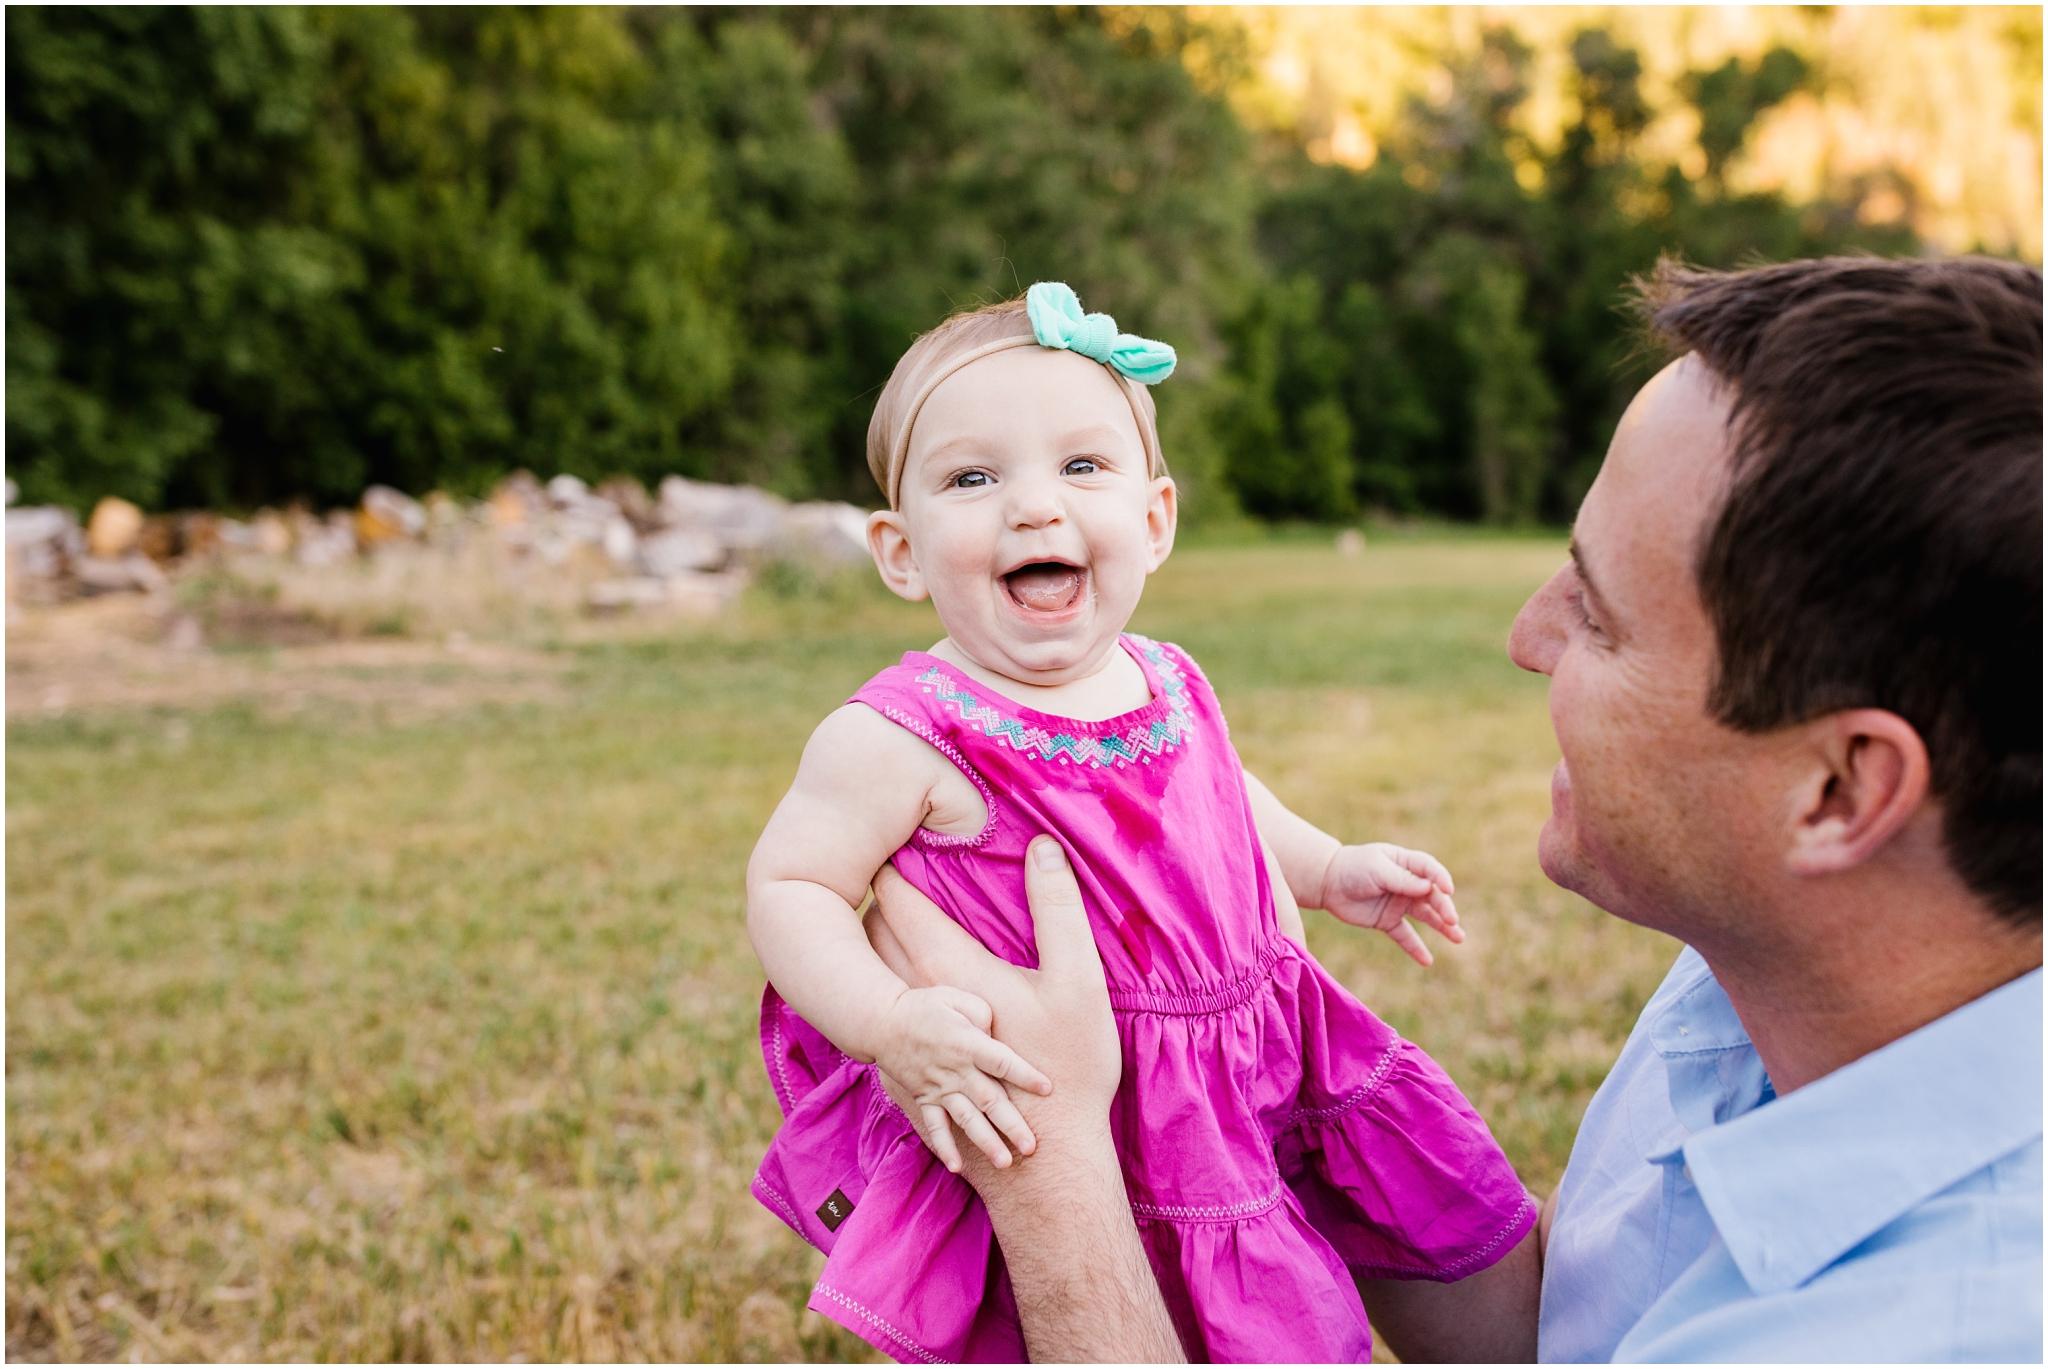 Lizzie-B-Imagery-Utah-Family-Photographer-Utah-County-Photographer-Hobble-Creek-Canyon_0014.jpg